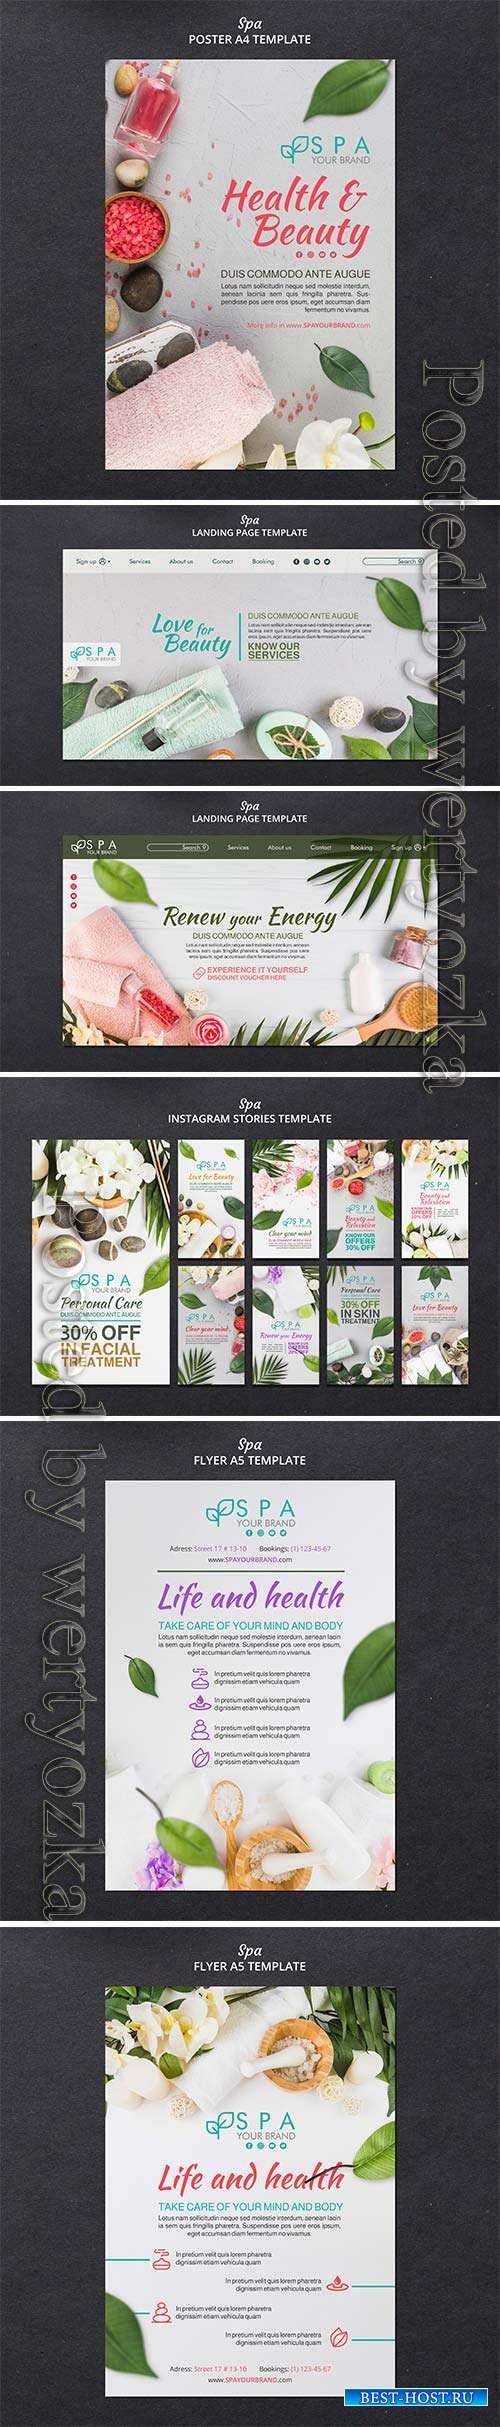 Spa concept flyer template